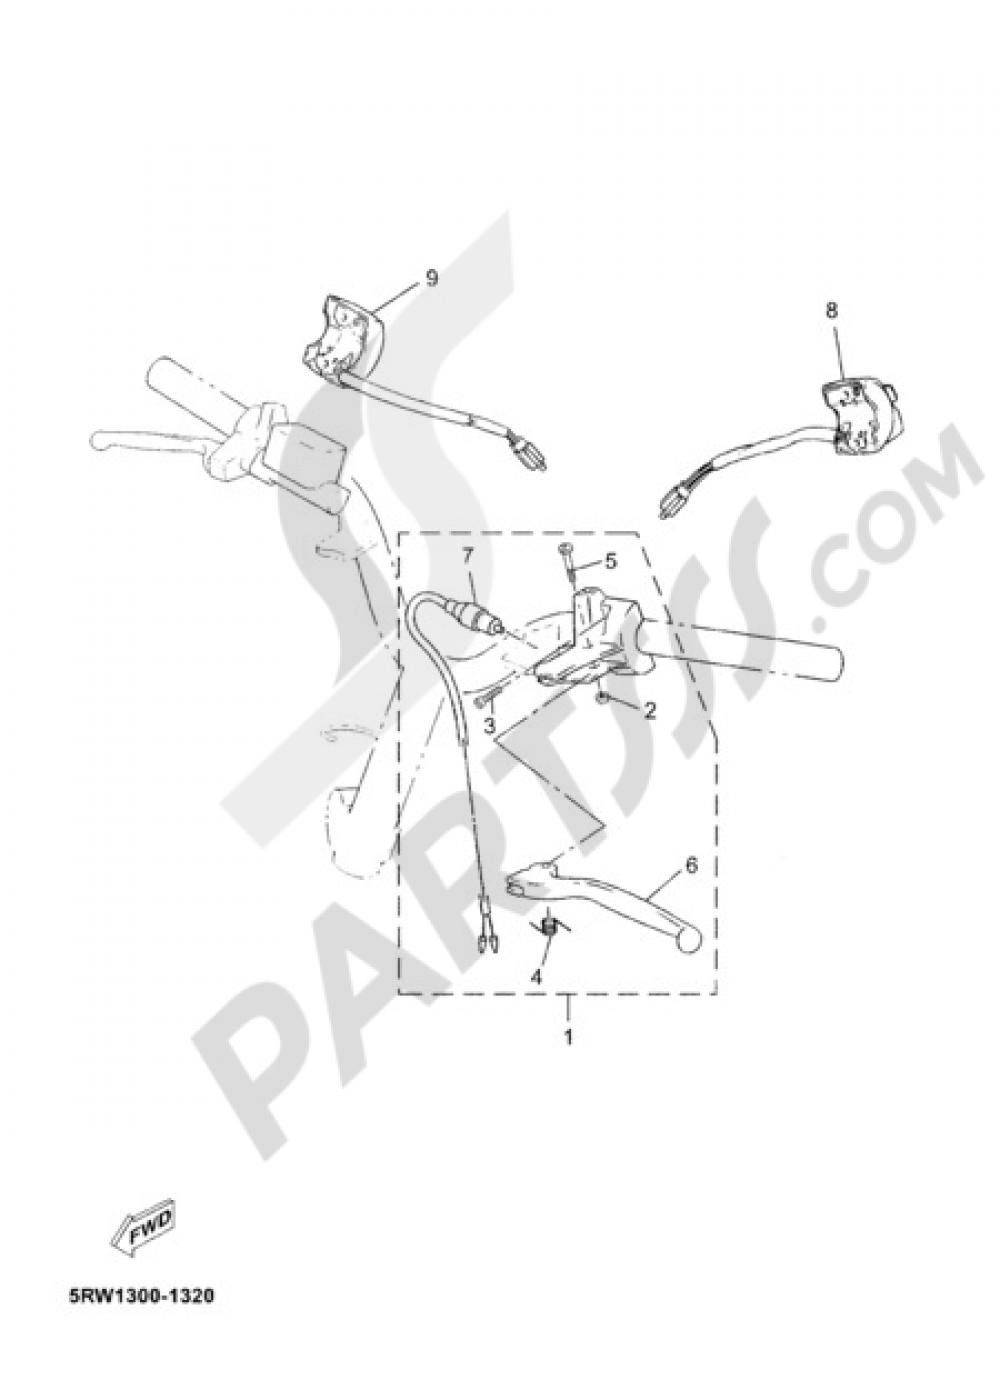 jog r 2005 43 fig 32 interruptor de manillarpalanc_1000 start stop jog diagram wiring diagram database